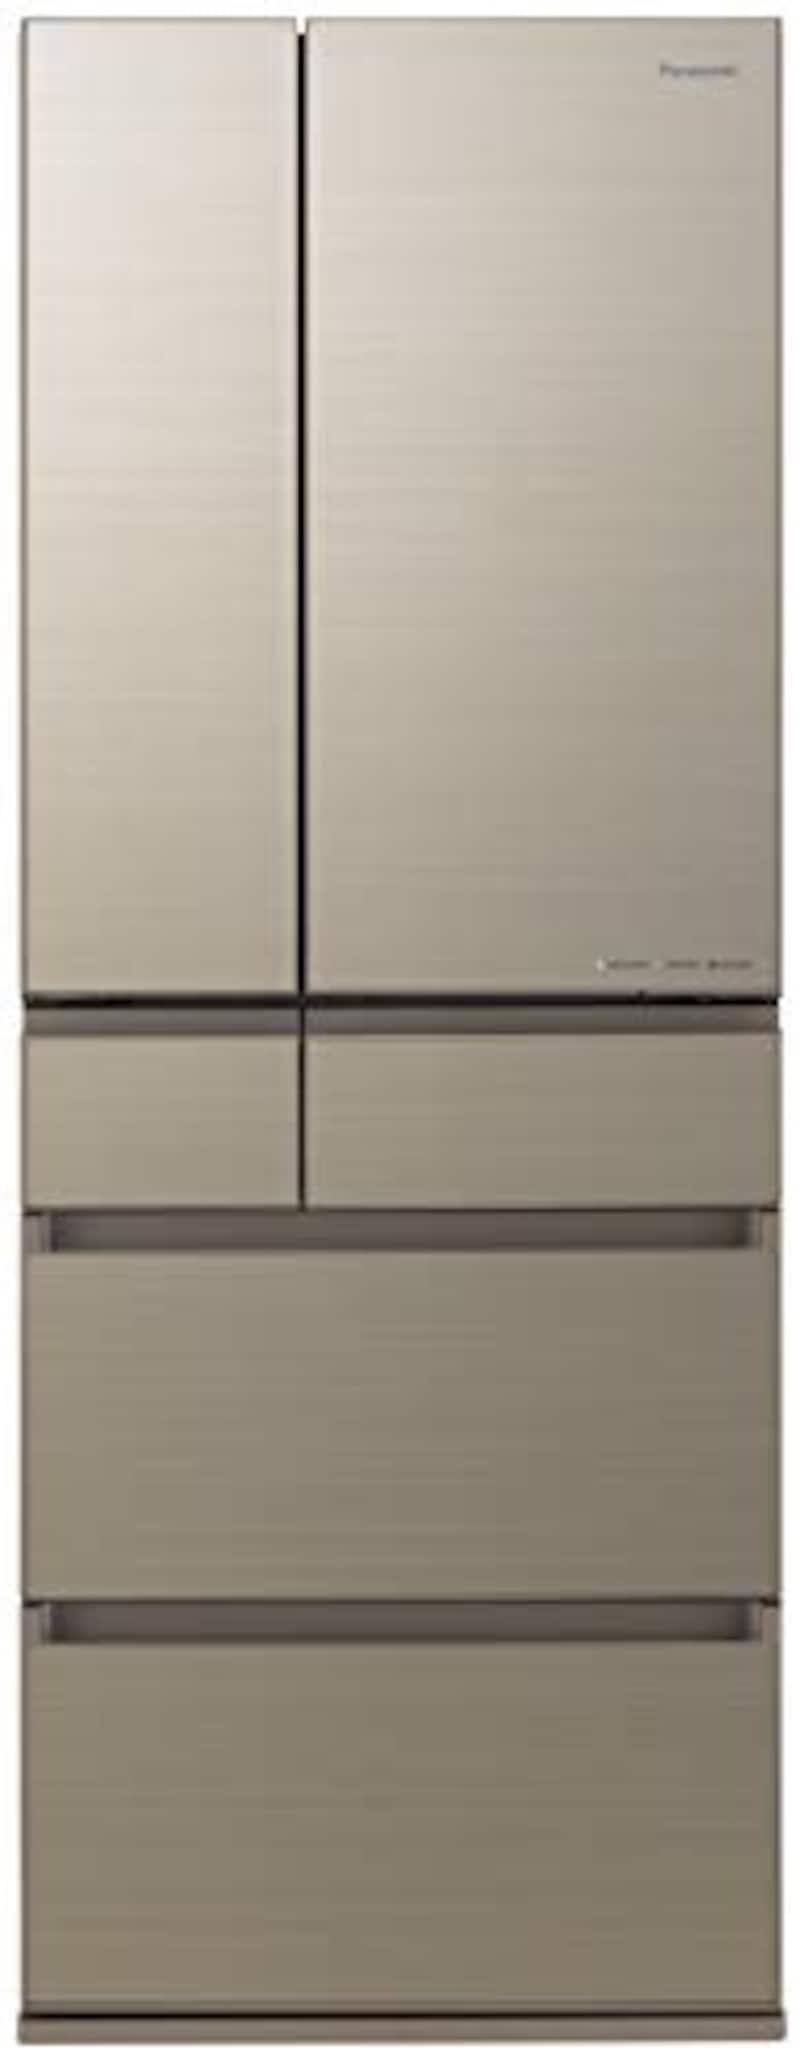 Panasonic(パナソニック),大容量冷蔵庫 600L アルベロゴールド,NR-F607HPX